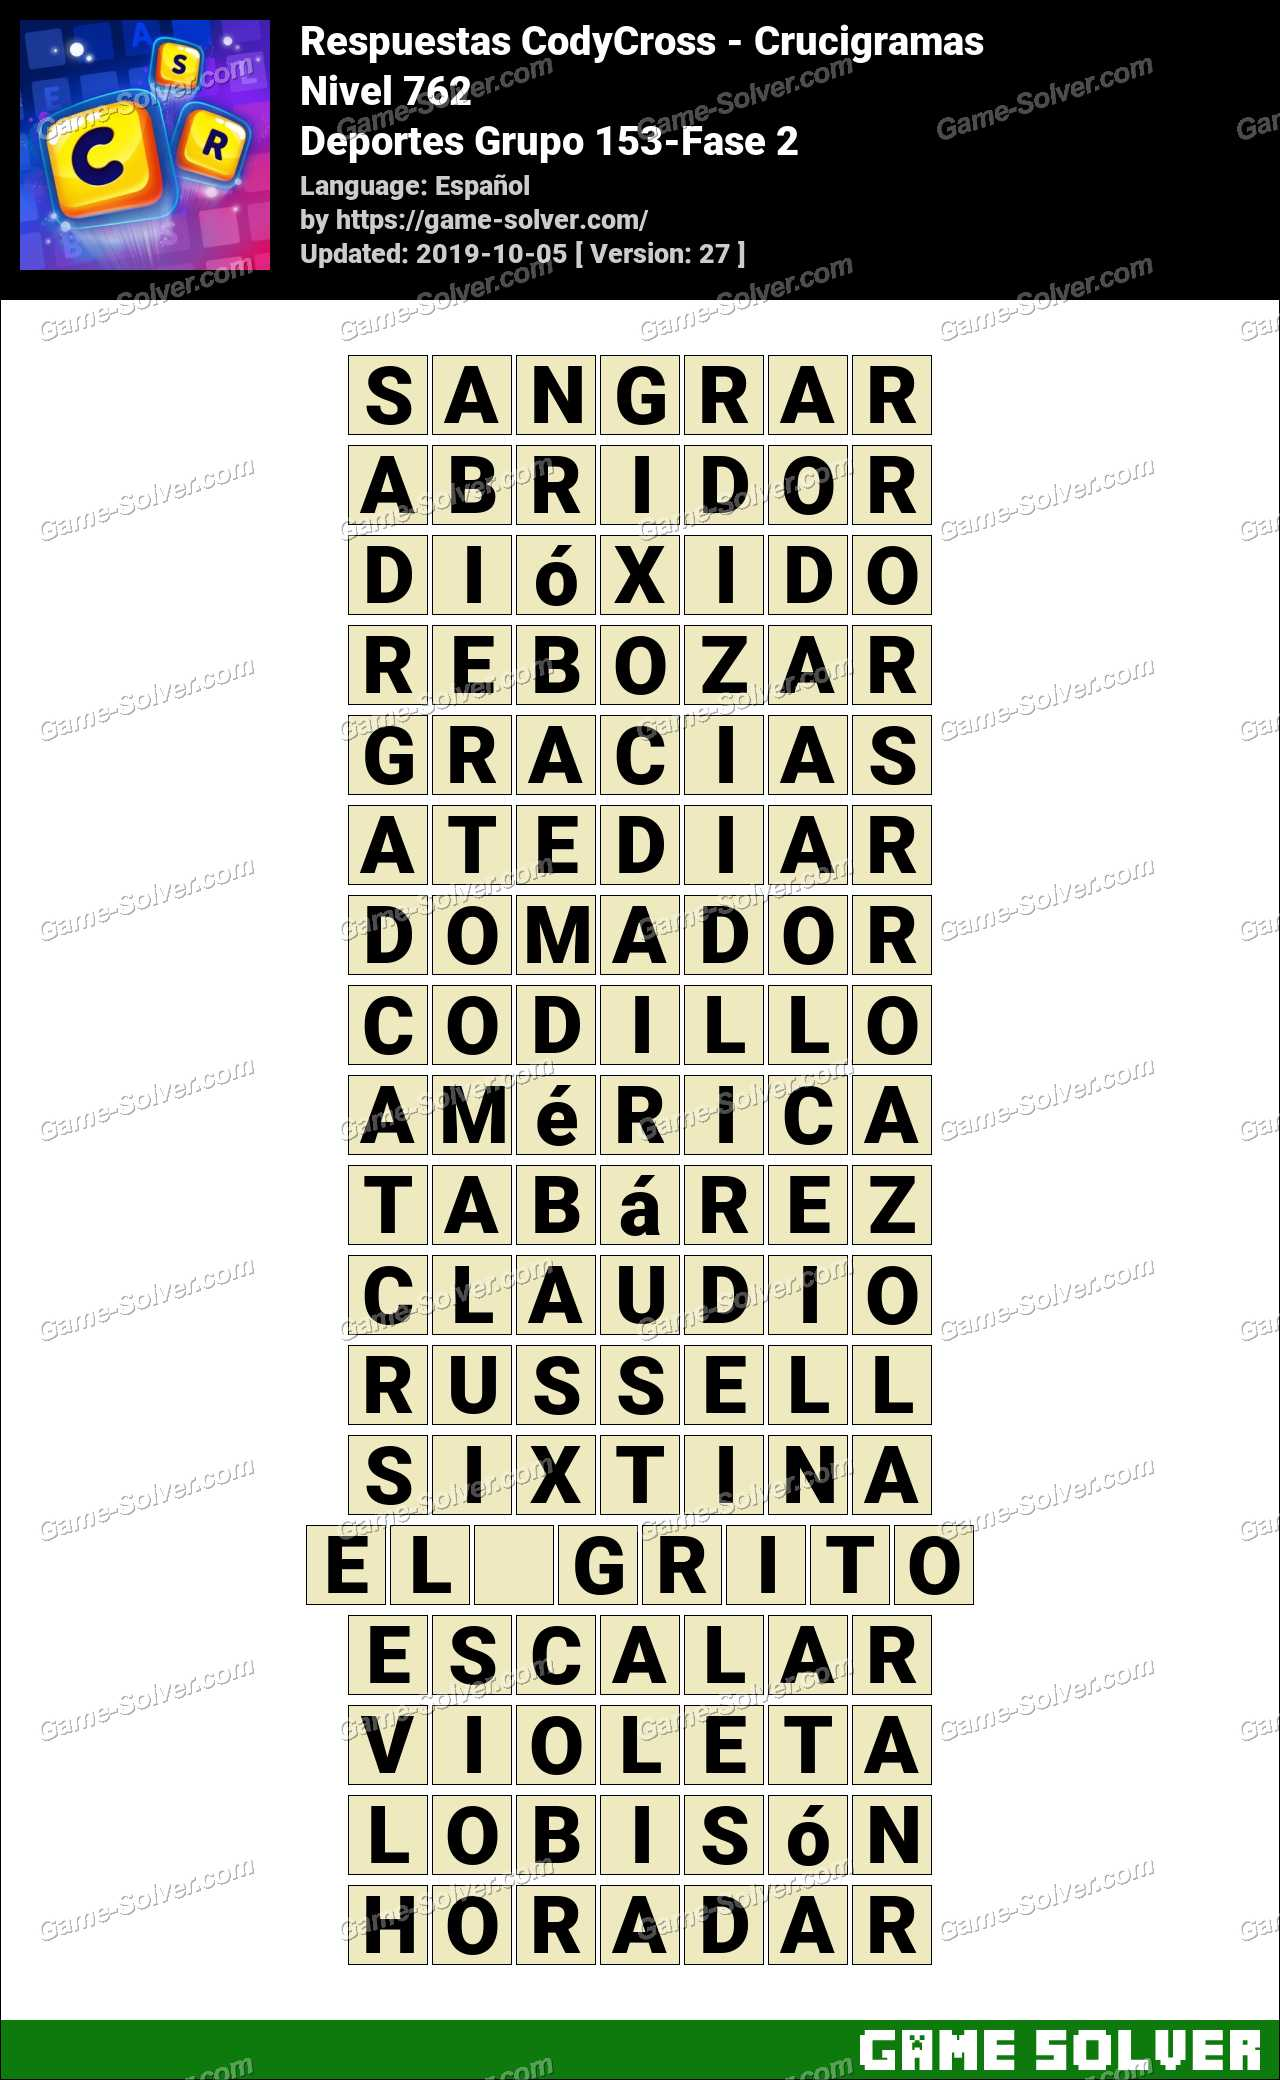 Respuestas CodyCross Deportes Grupo 153-Fase 2